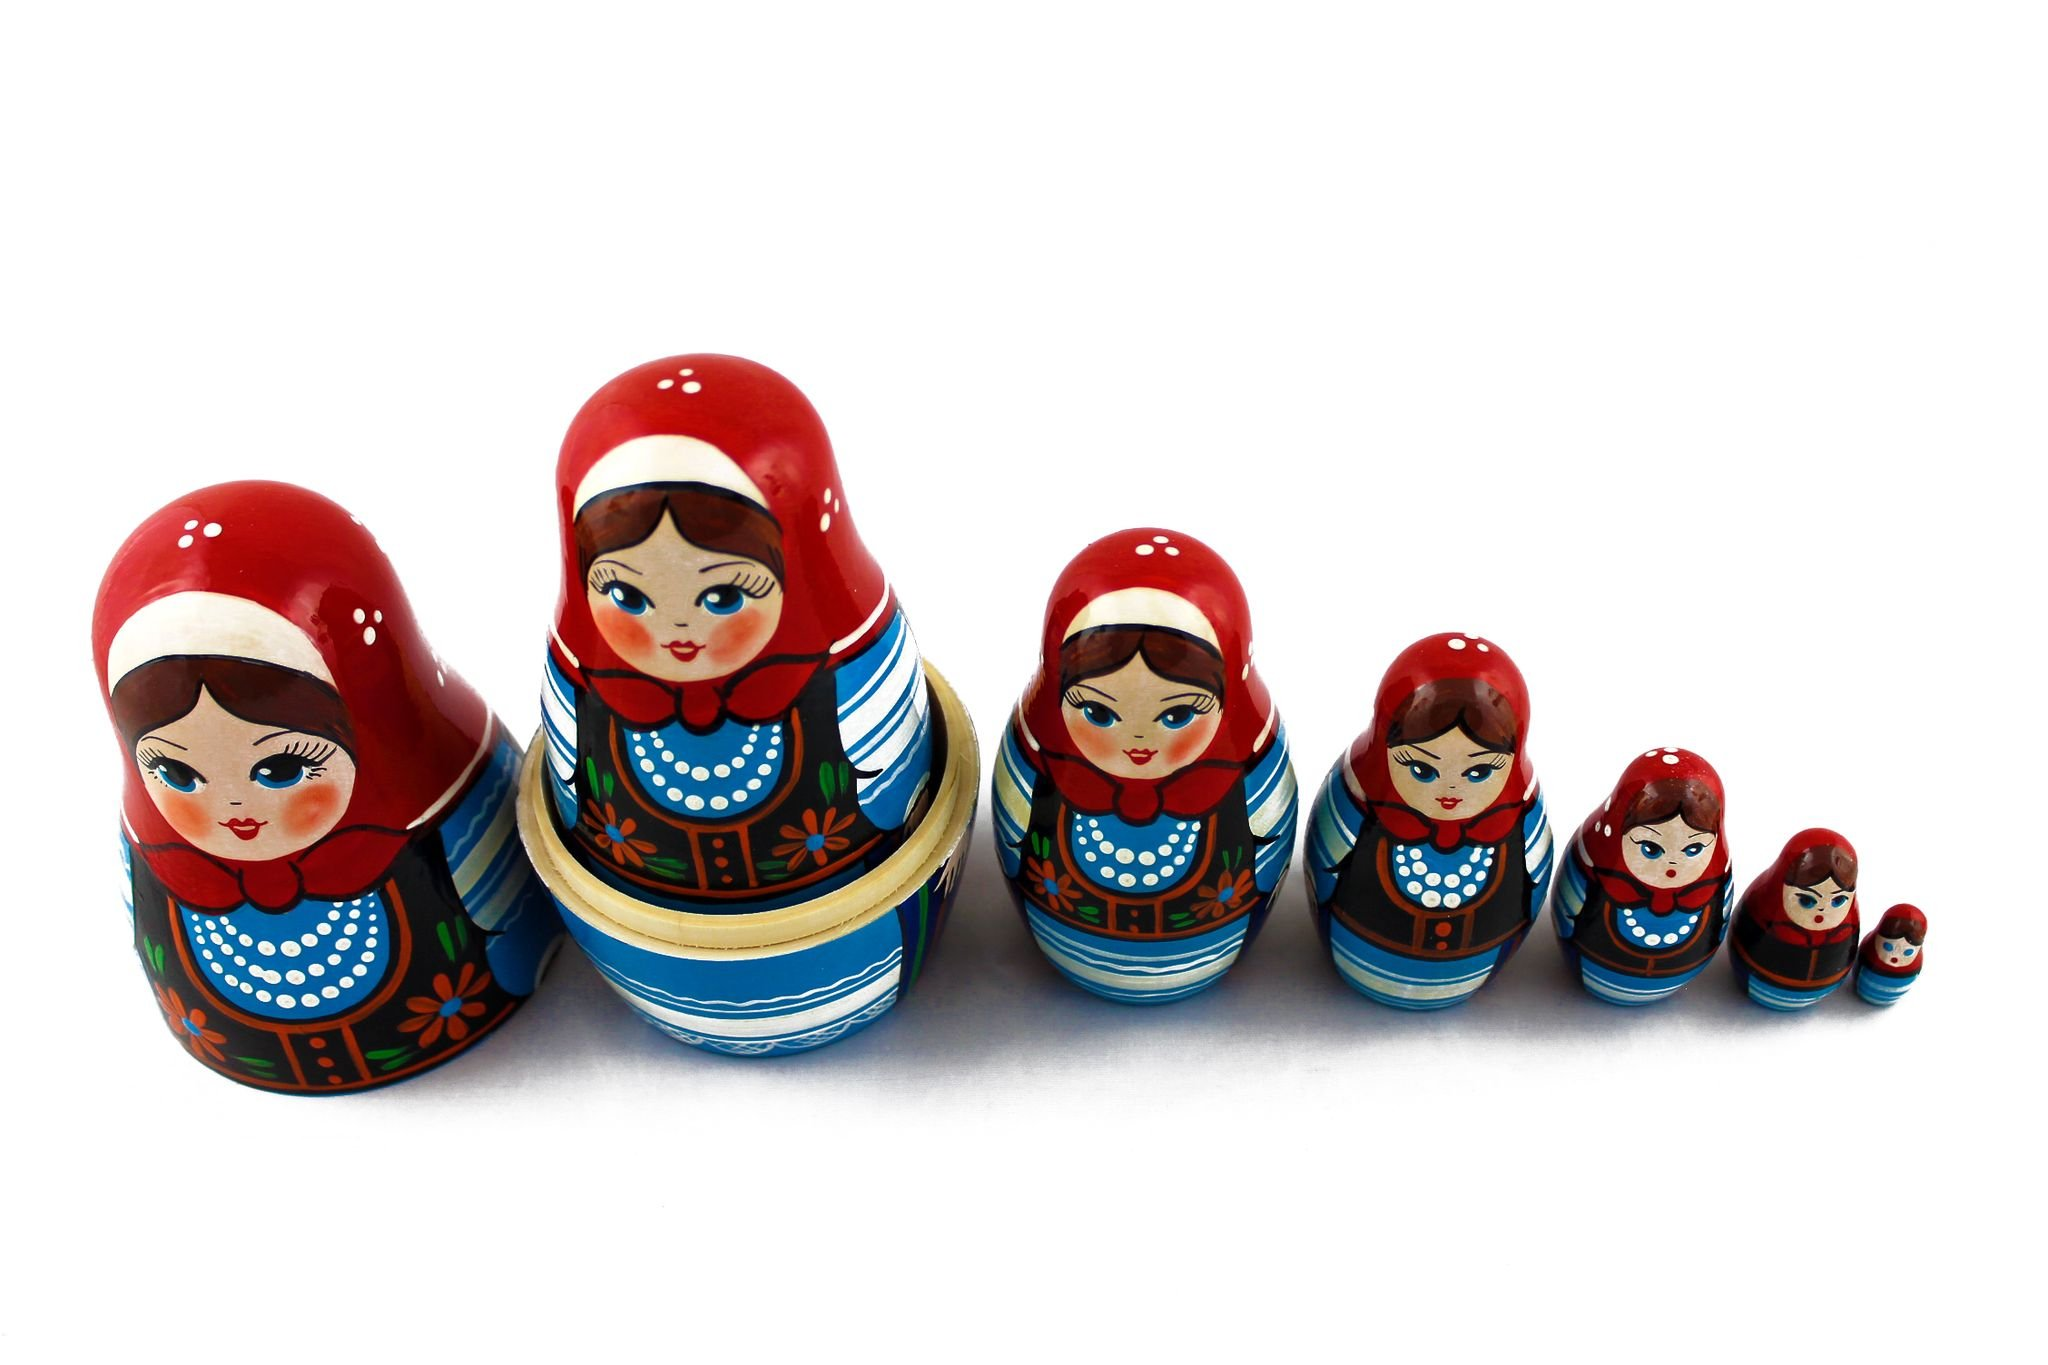 Matryoshka Polish National Dress Babushka Russian Nesting Wooden Stacking Doll 7 Pcs by MATRYOSHKA&HANDICRAFT (Image #5)